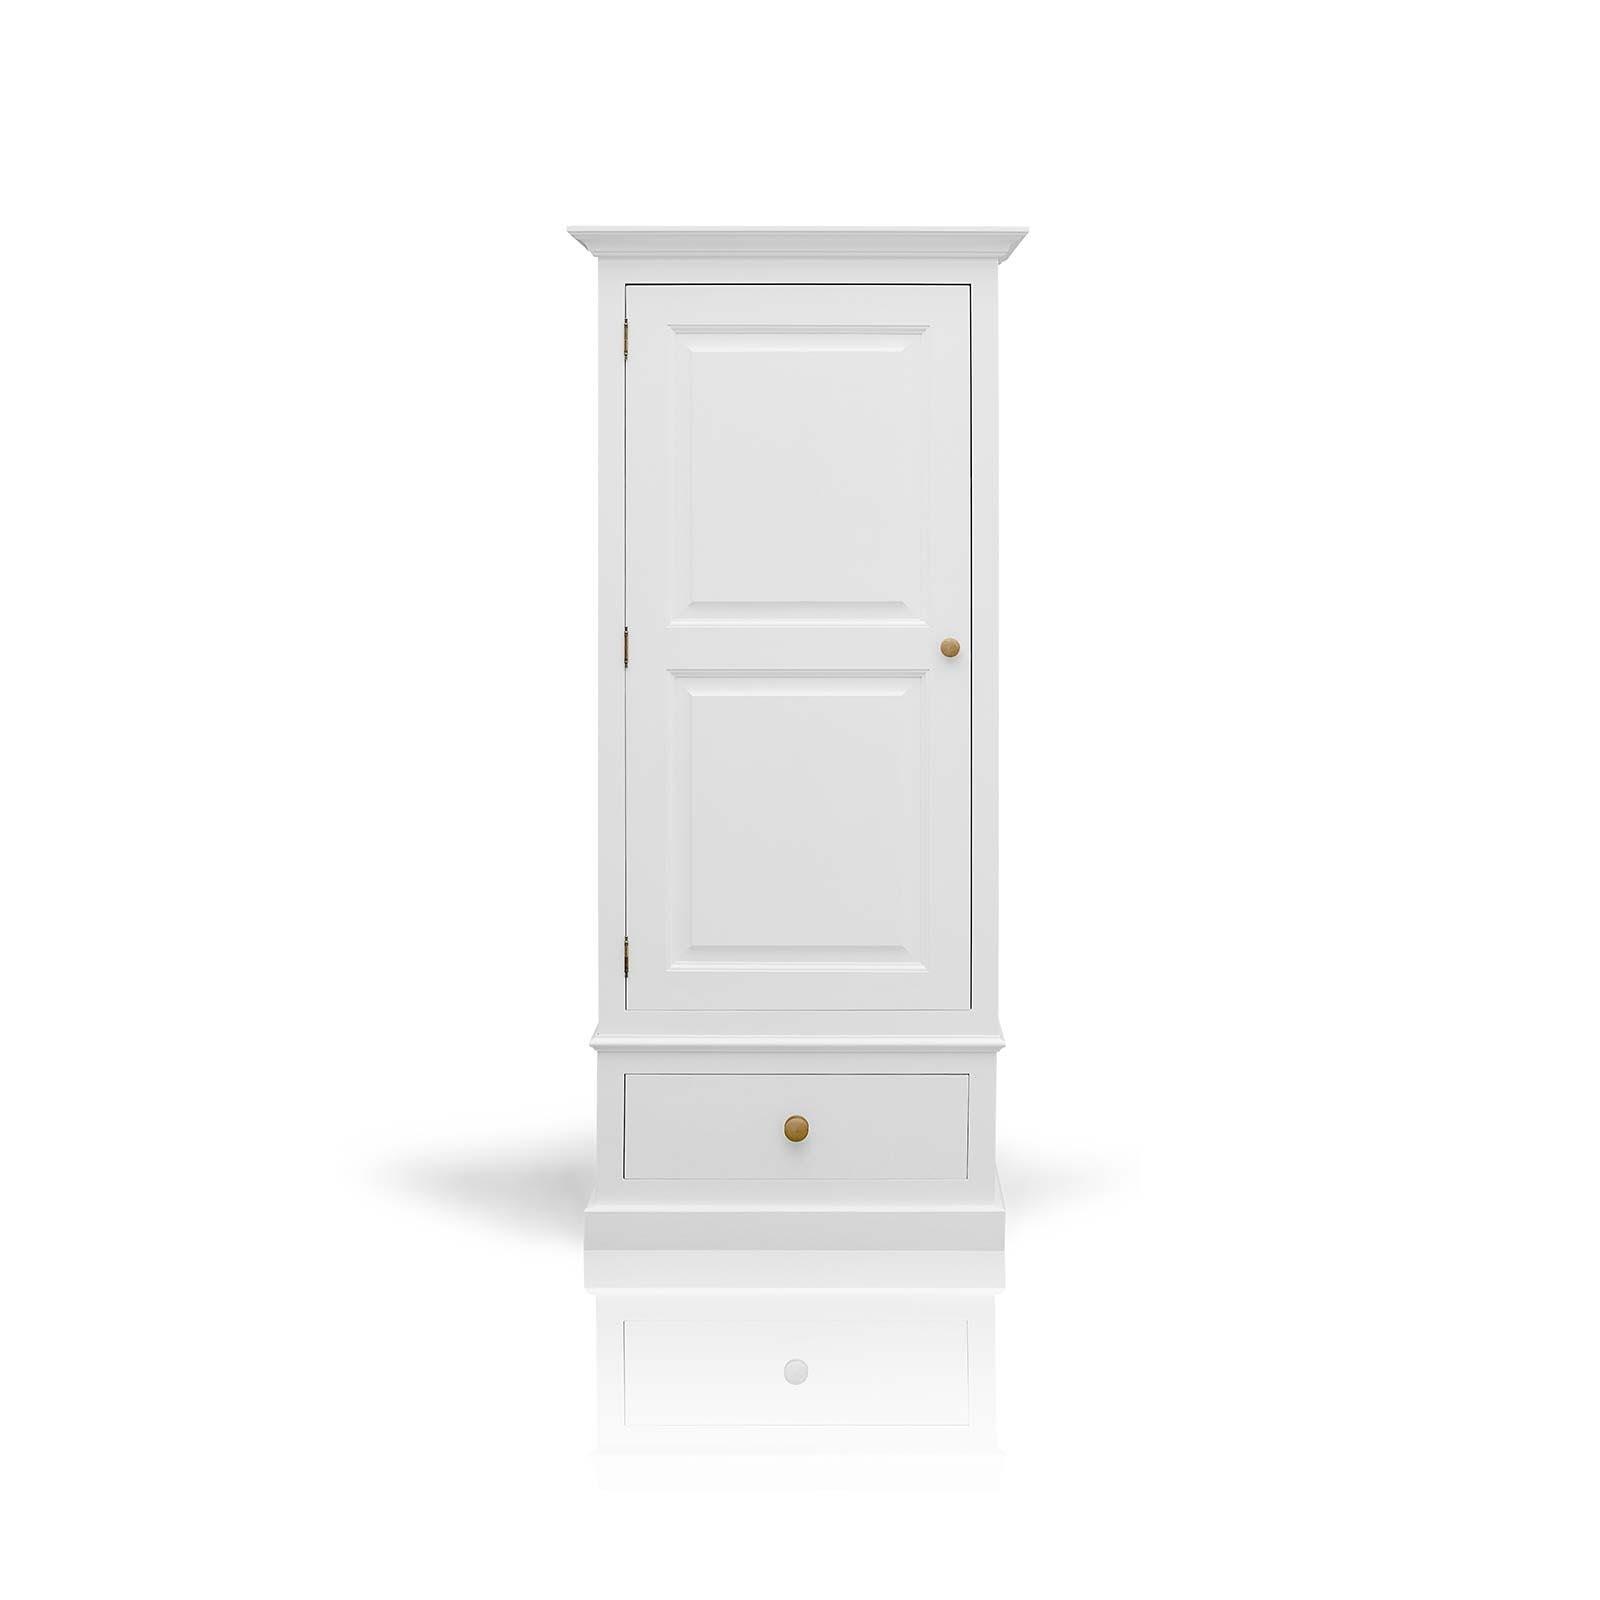 Mottisfont Painted Pine Single Wardrobe 1 Drawer Pertaining To 2018 Single White Wardrobes (View 3 of 15)